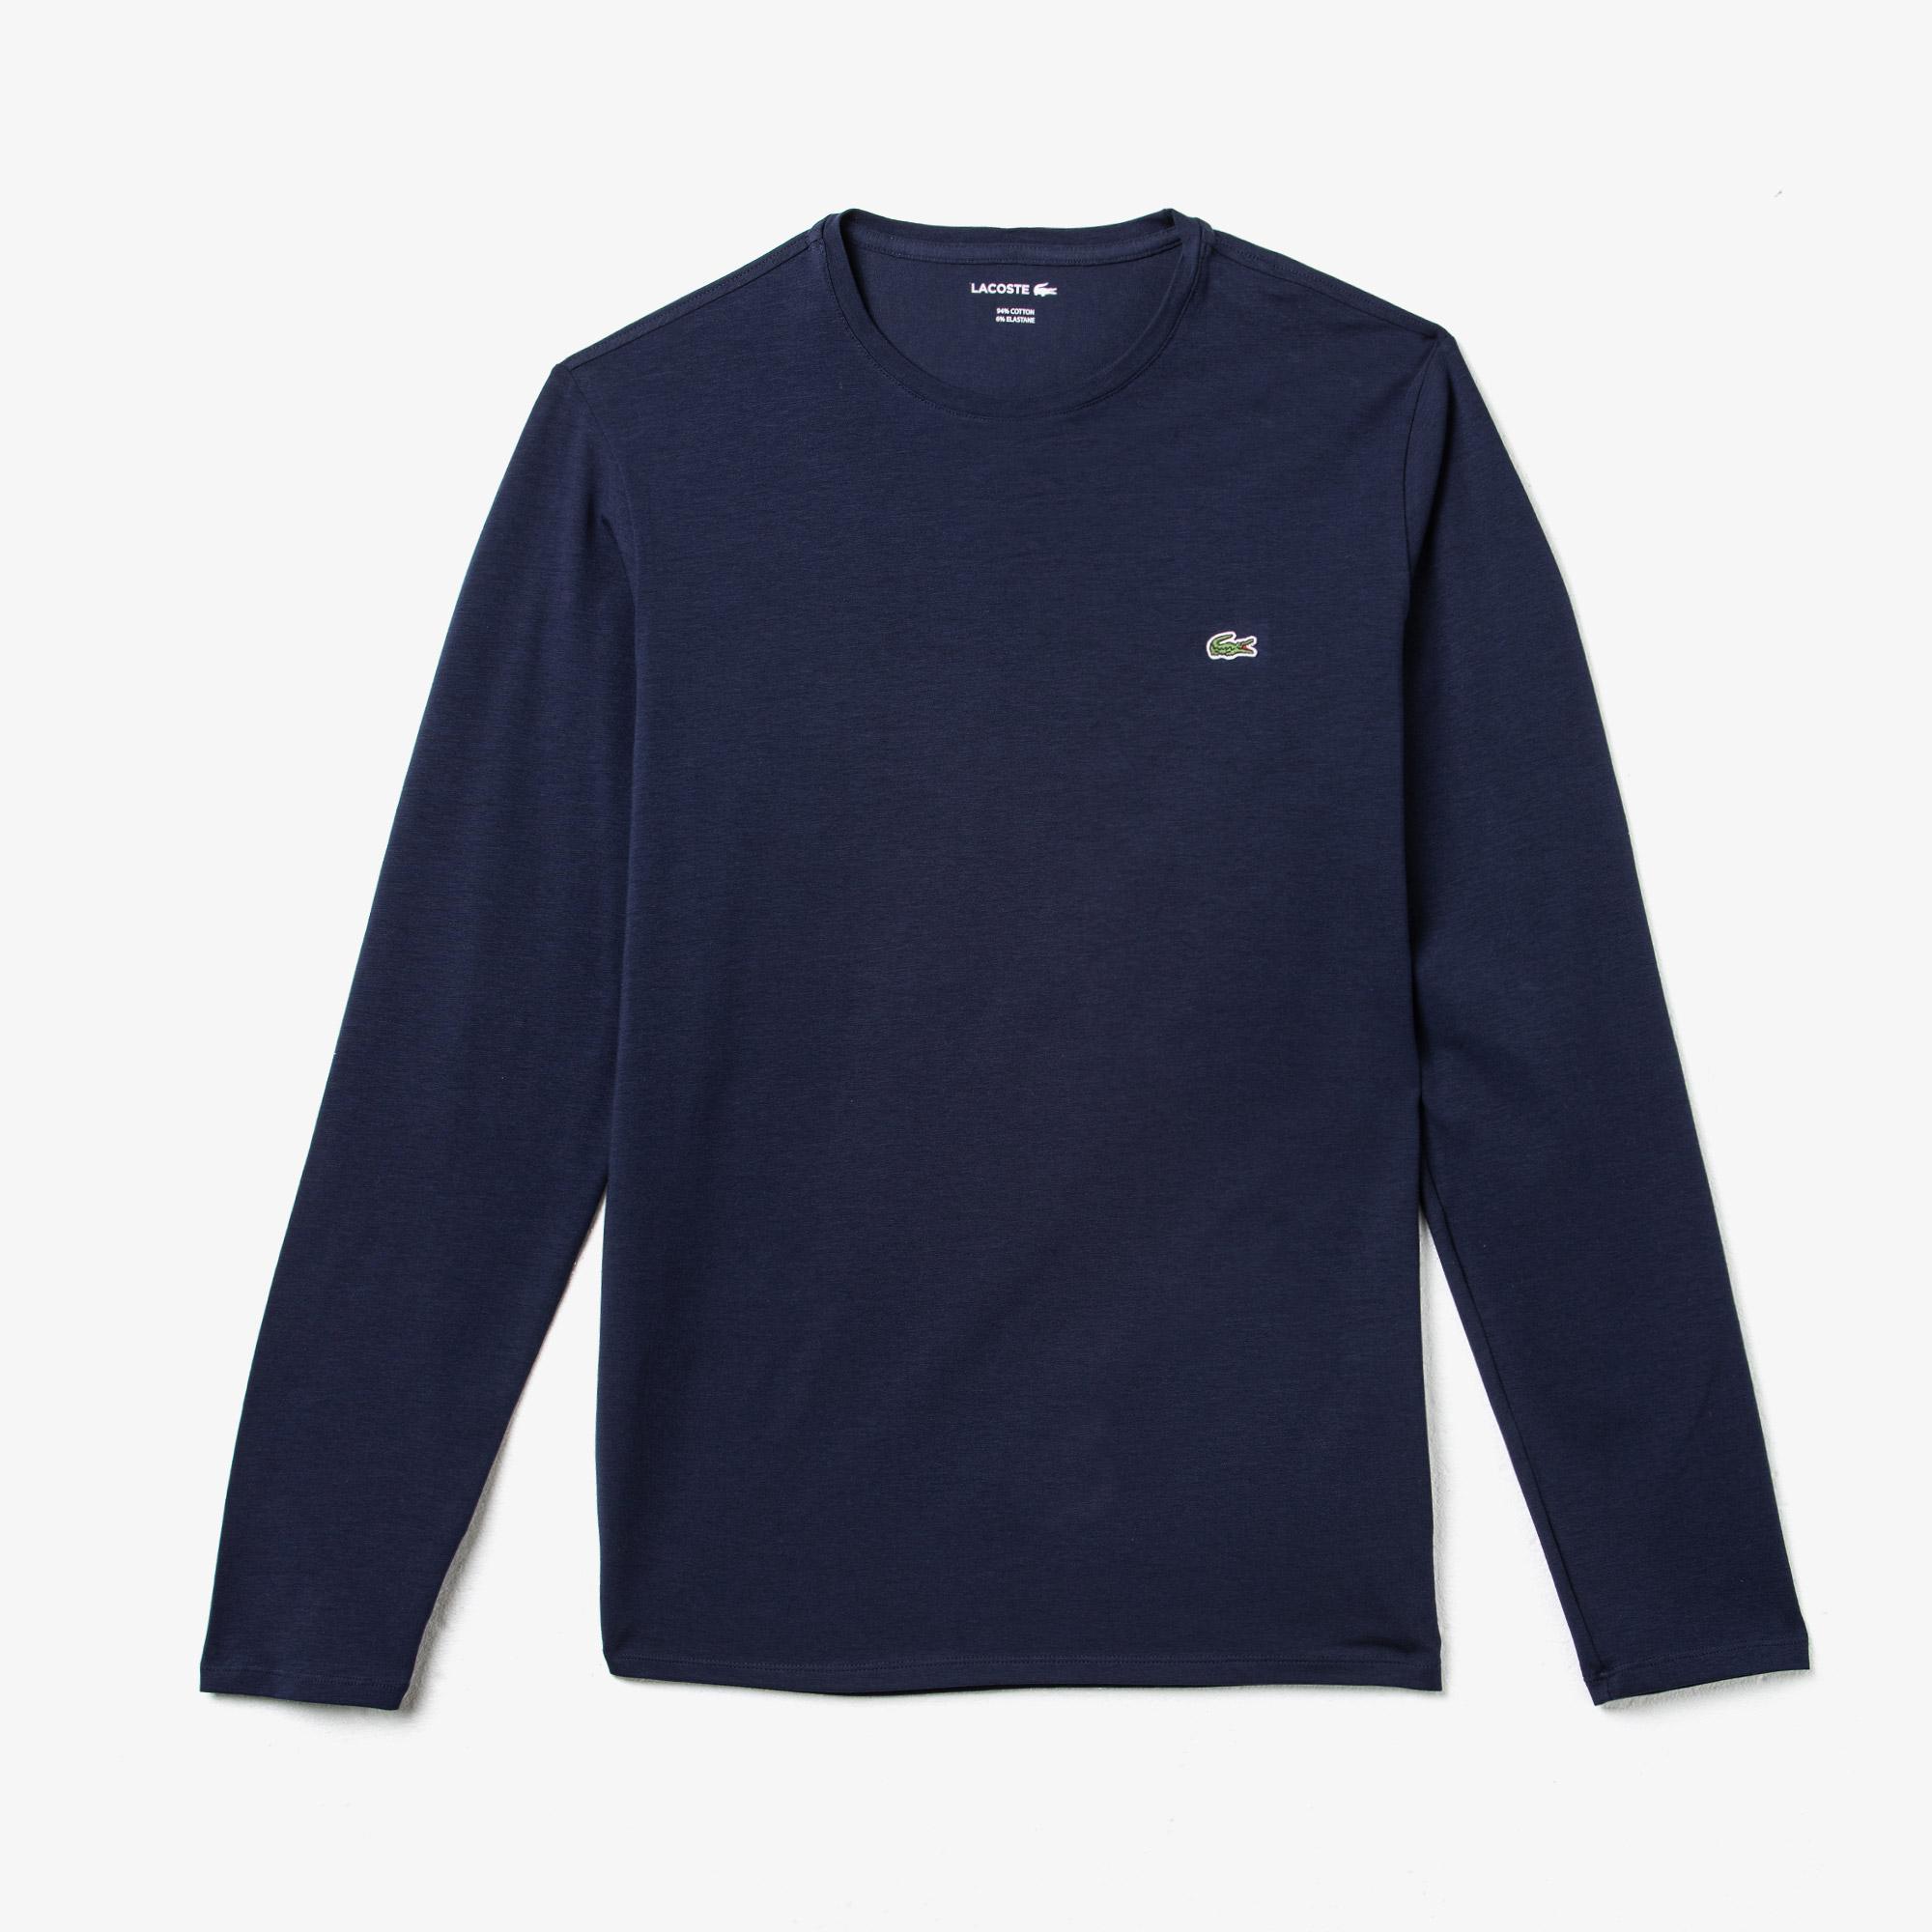 Lacoste Erkek Uzun Kollu Lacivert T-Shirt